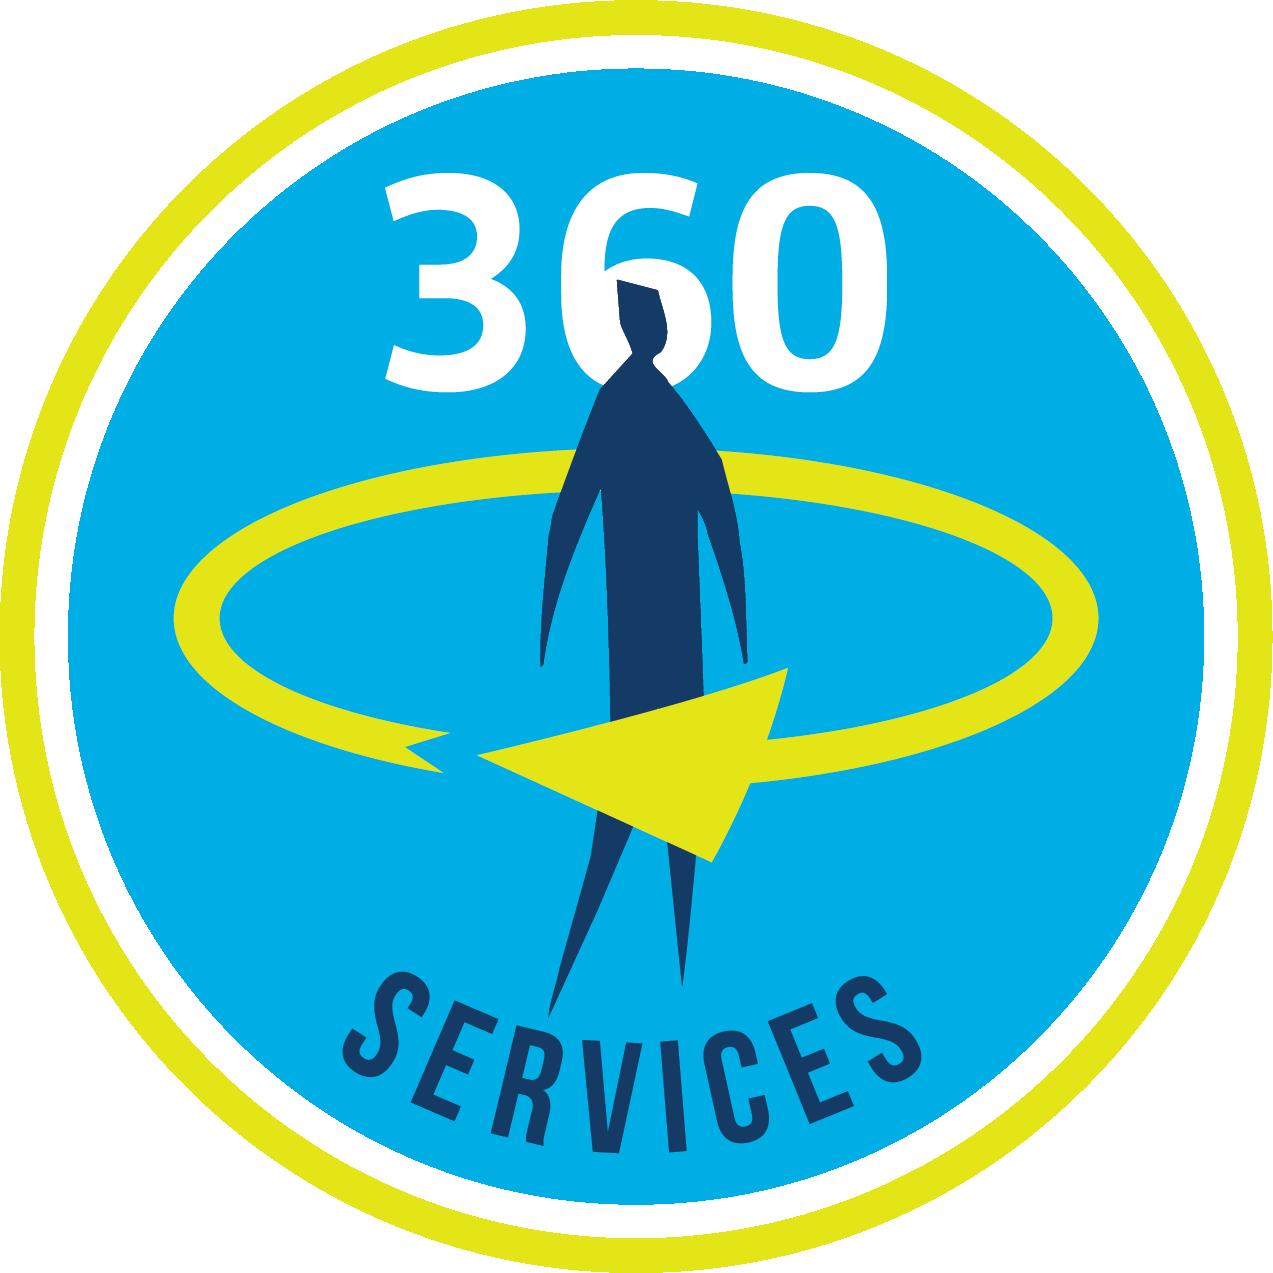 aclvb-universele_diensten-logo-cmyk_ok_fr_6.png